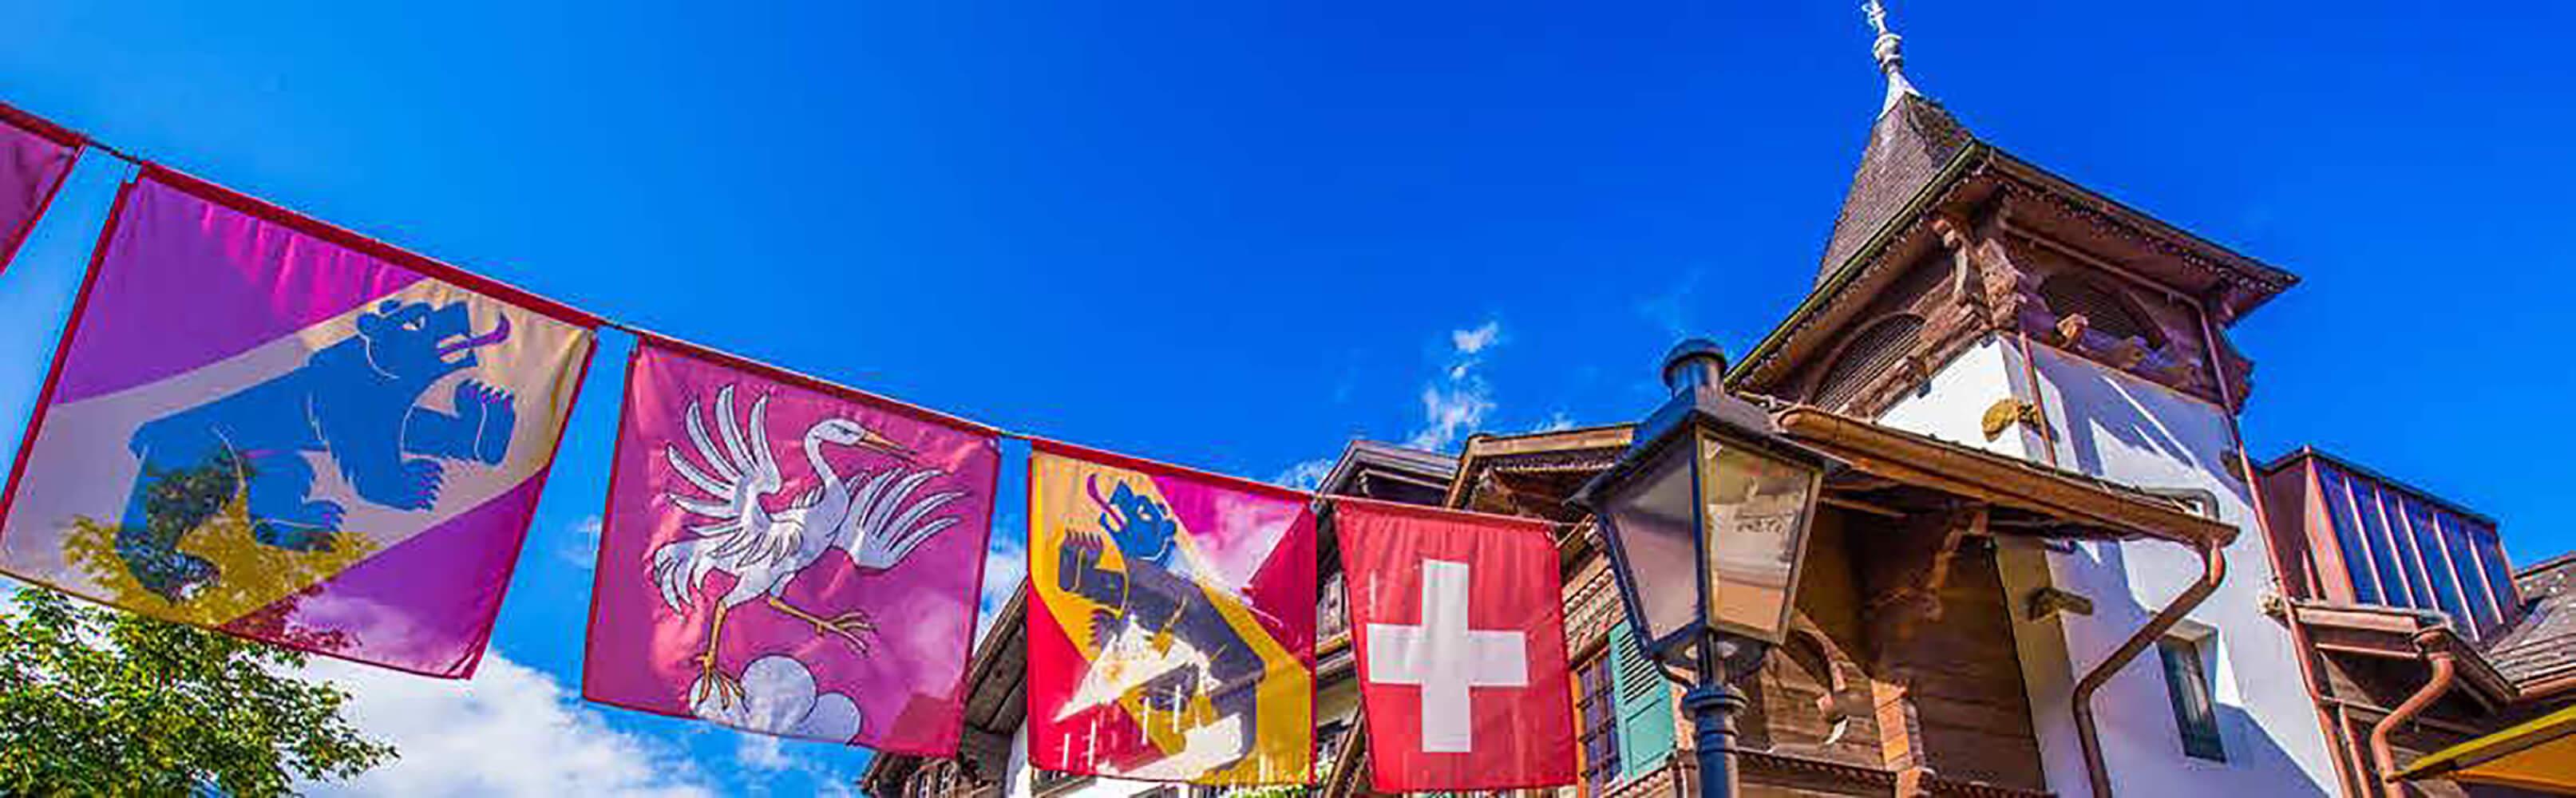 Gstaad Saaneland 1